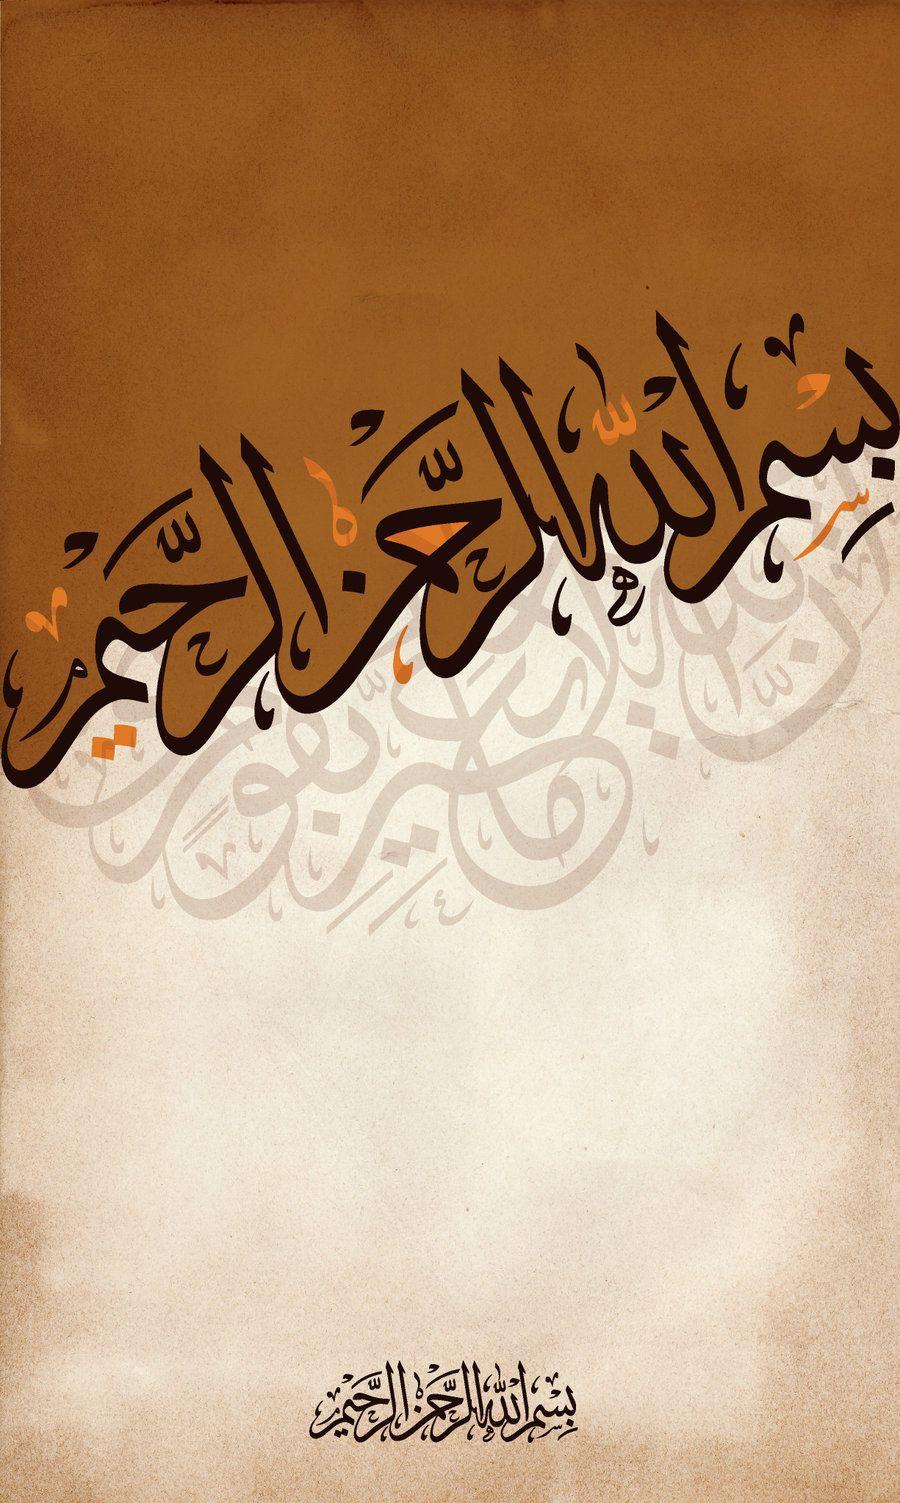 بسم الله الرحمن الرحيم In The Name Of Allah The Most Gracious The Most Merciful Sou Islamic Calligraphy Islamic Calligraphy Painting Islamic Art Calligraphy